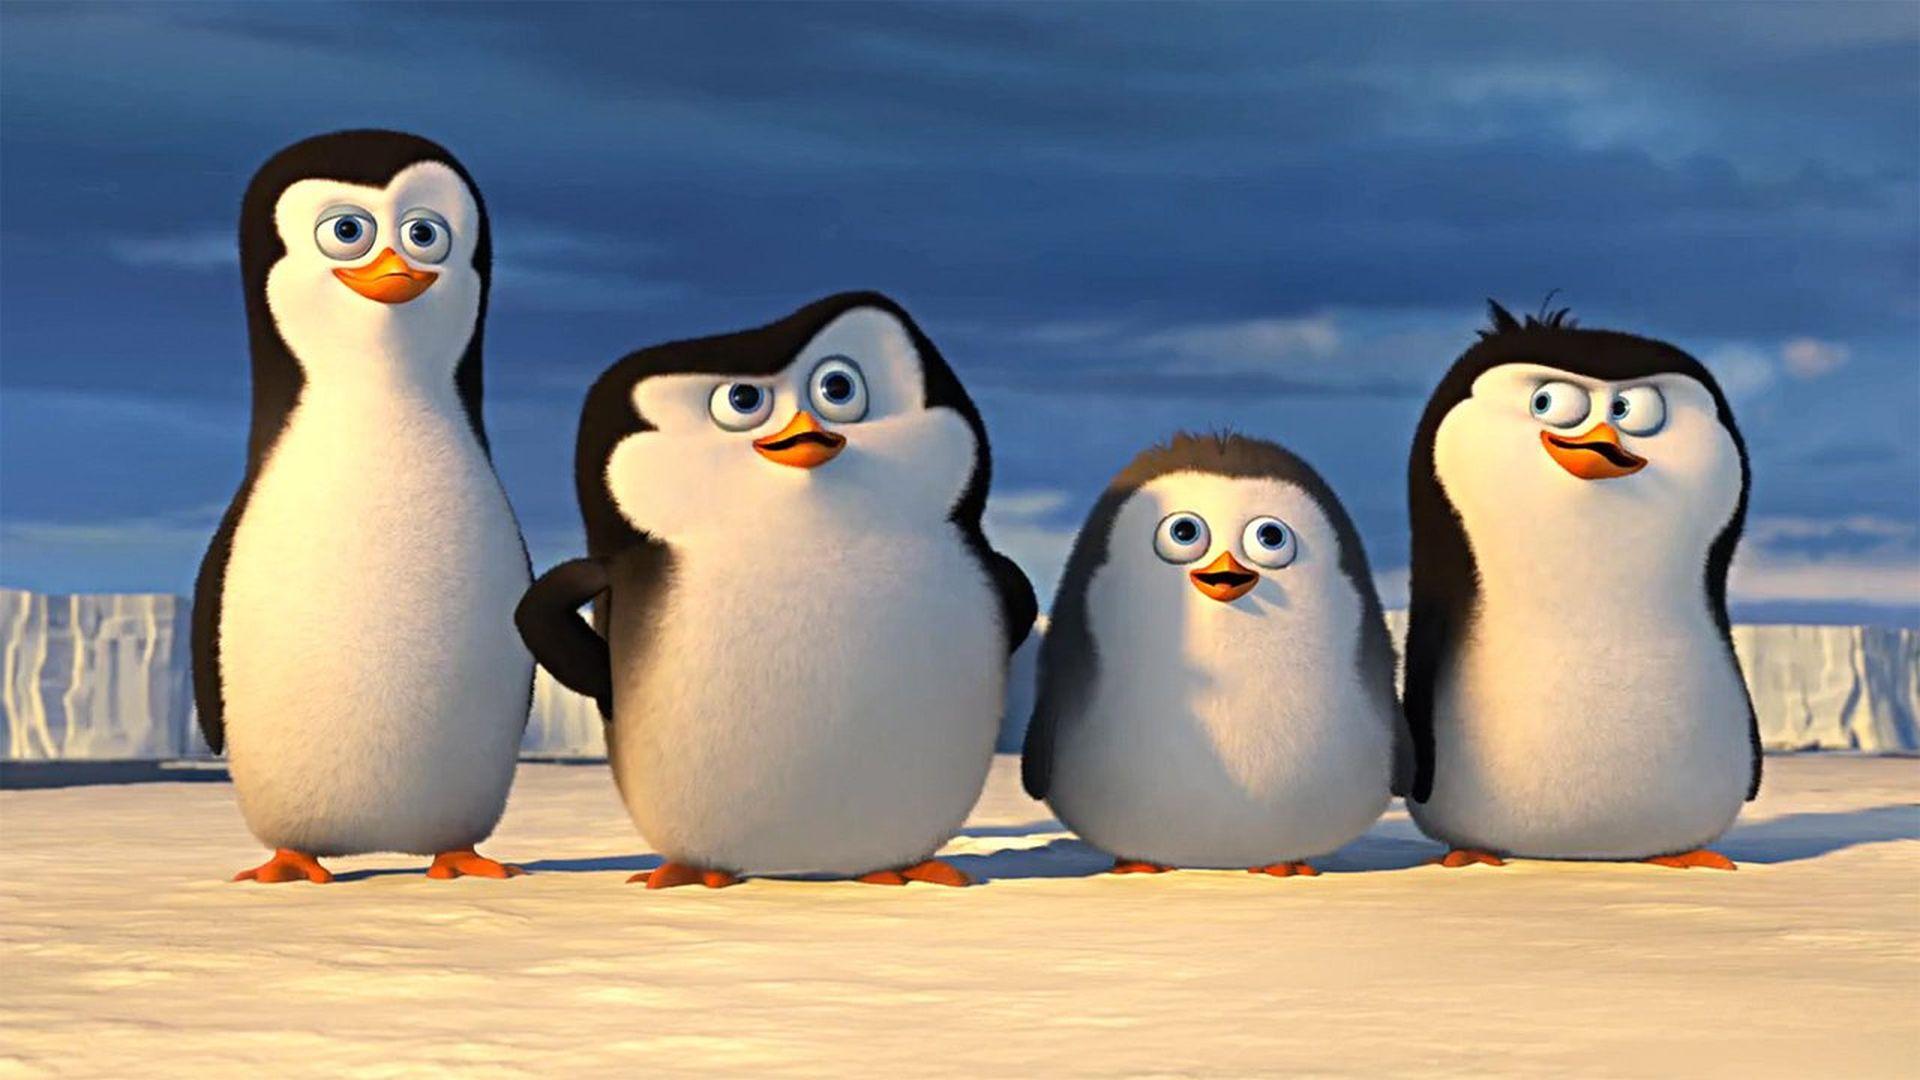 Los ping inos de madagascar full hd fondo de pantalla and - Pinguini di natale immagini ...